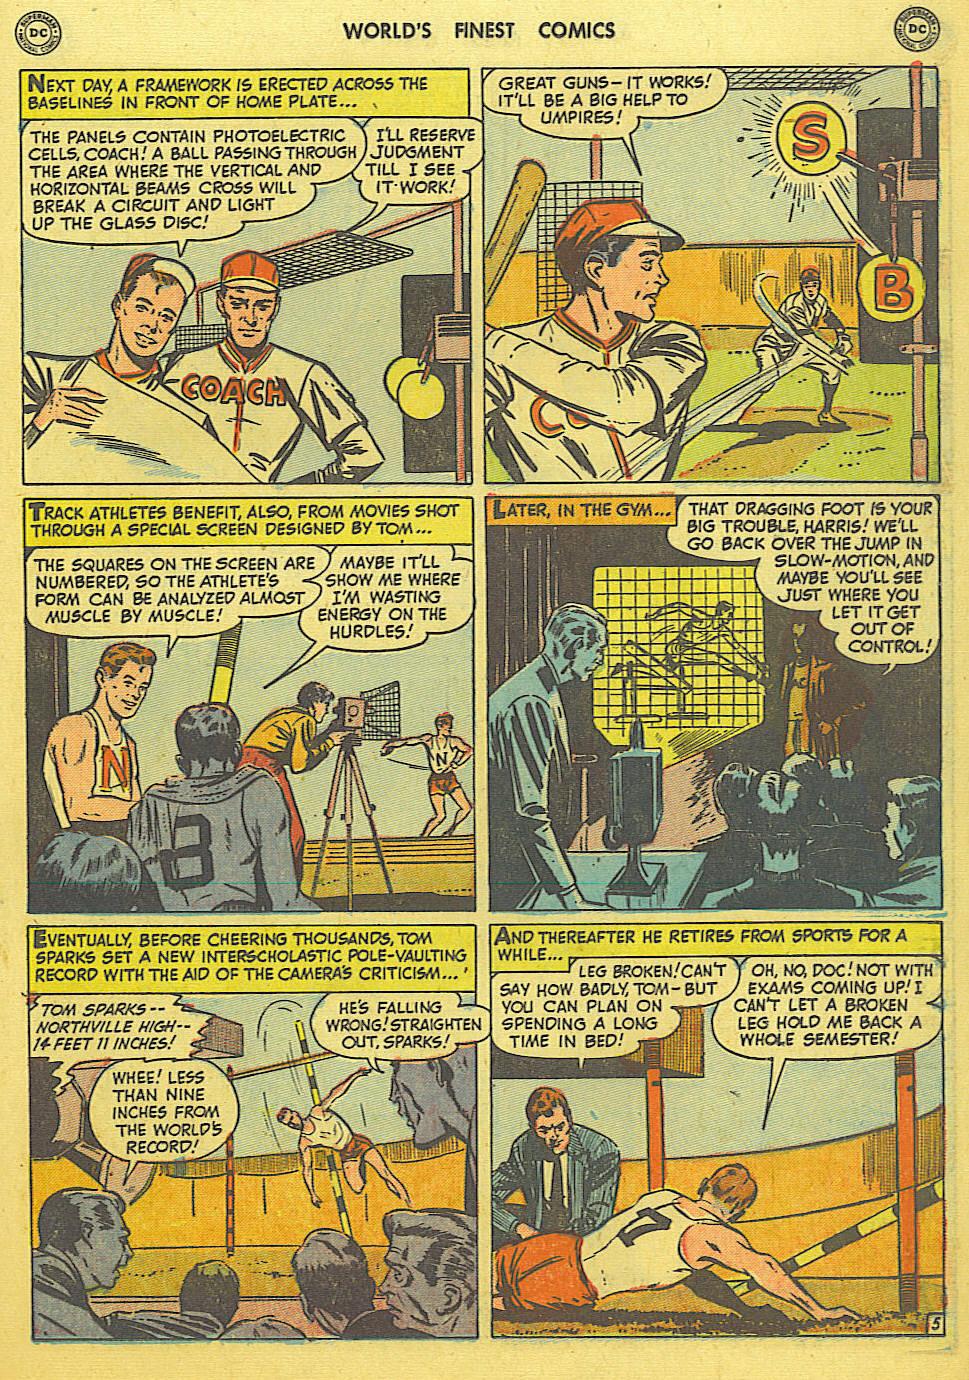 Read online World's Finest Comics comic -  Issue #49 - 34